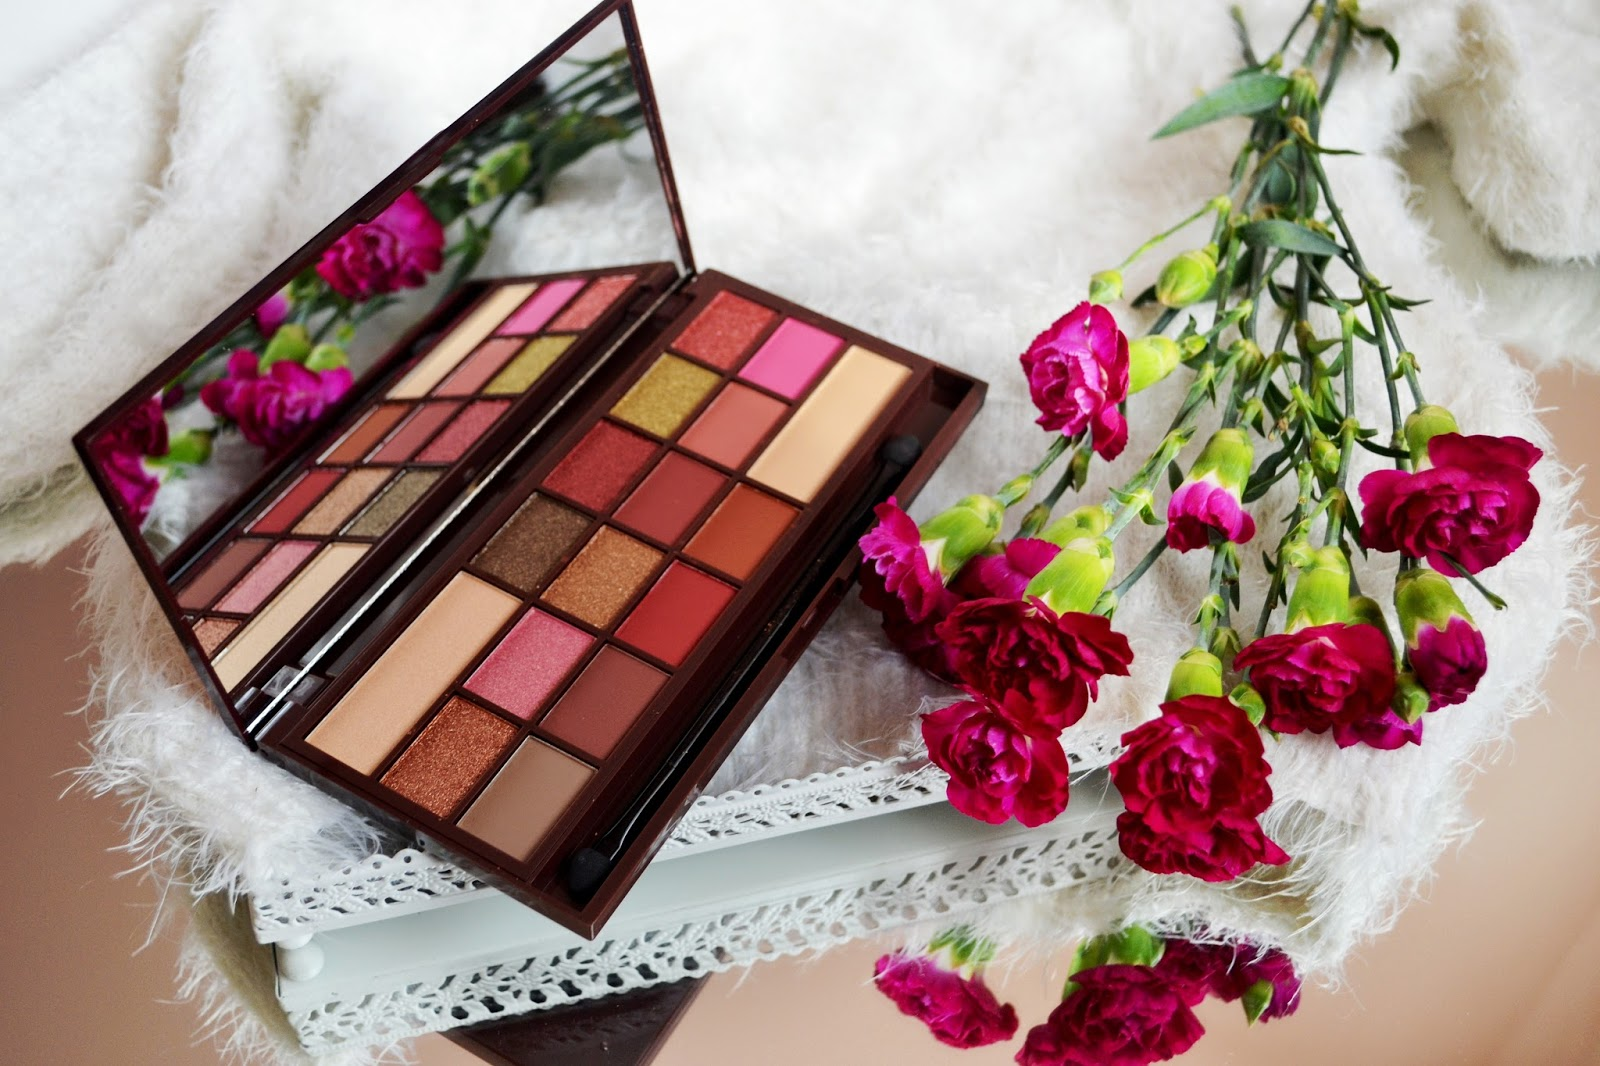 Makeup Revolution ROSE GOLD - najpiękniesza z całej kolekcji?